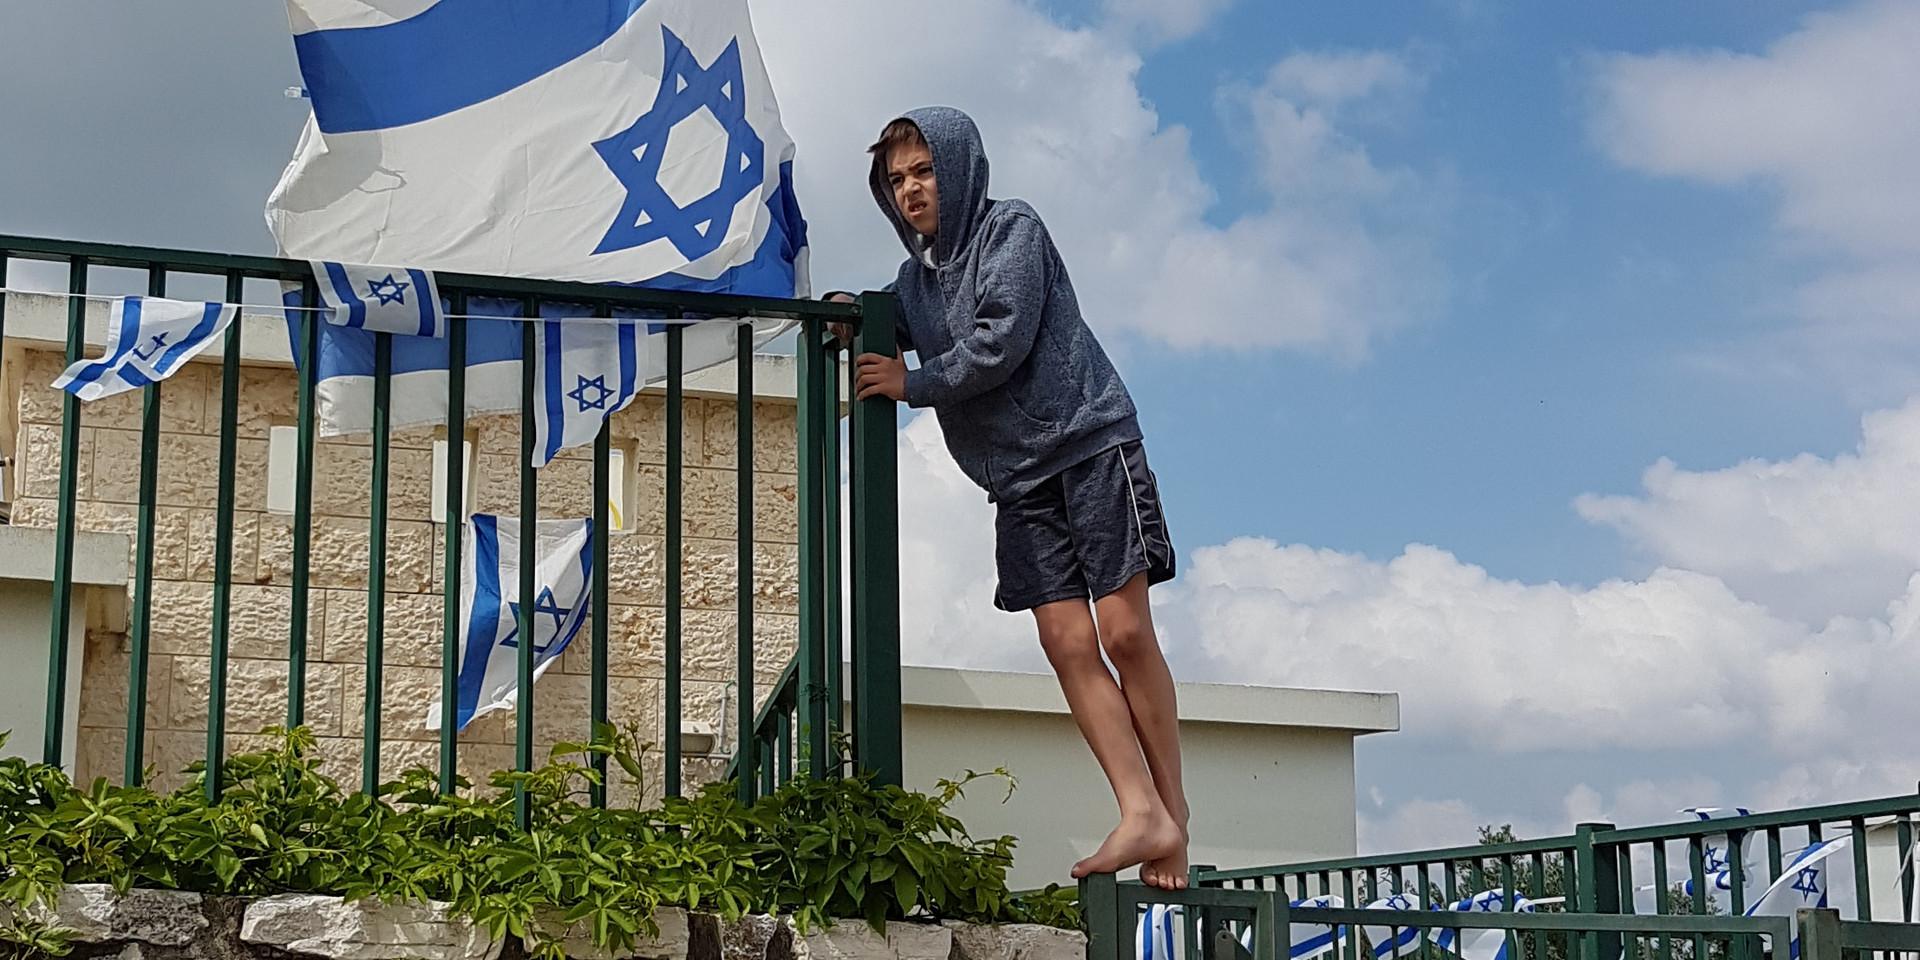 Photo by: Talia Keren, Israel